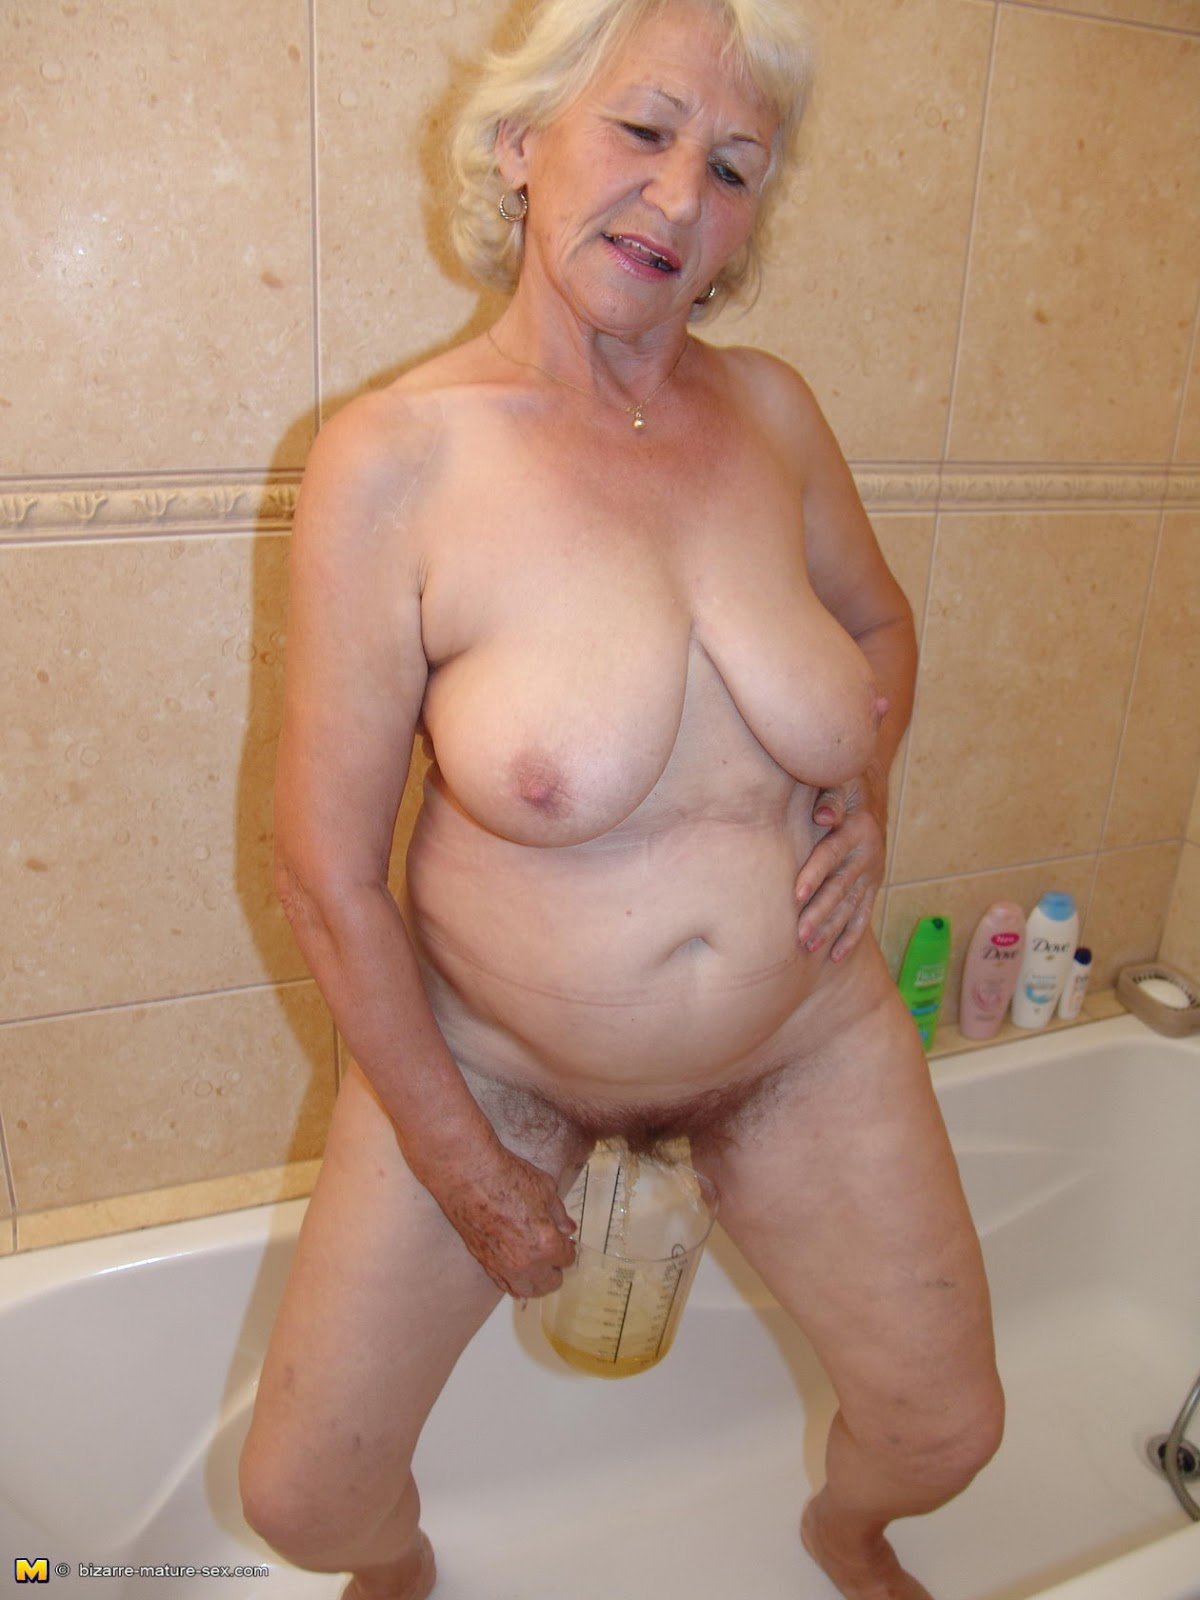 The granny norma lesbian